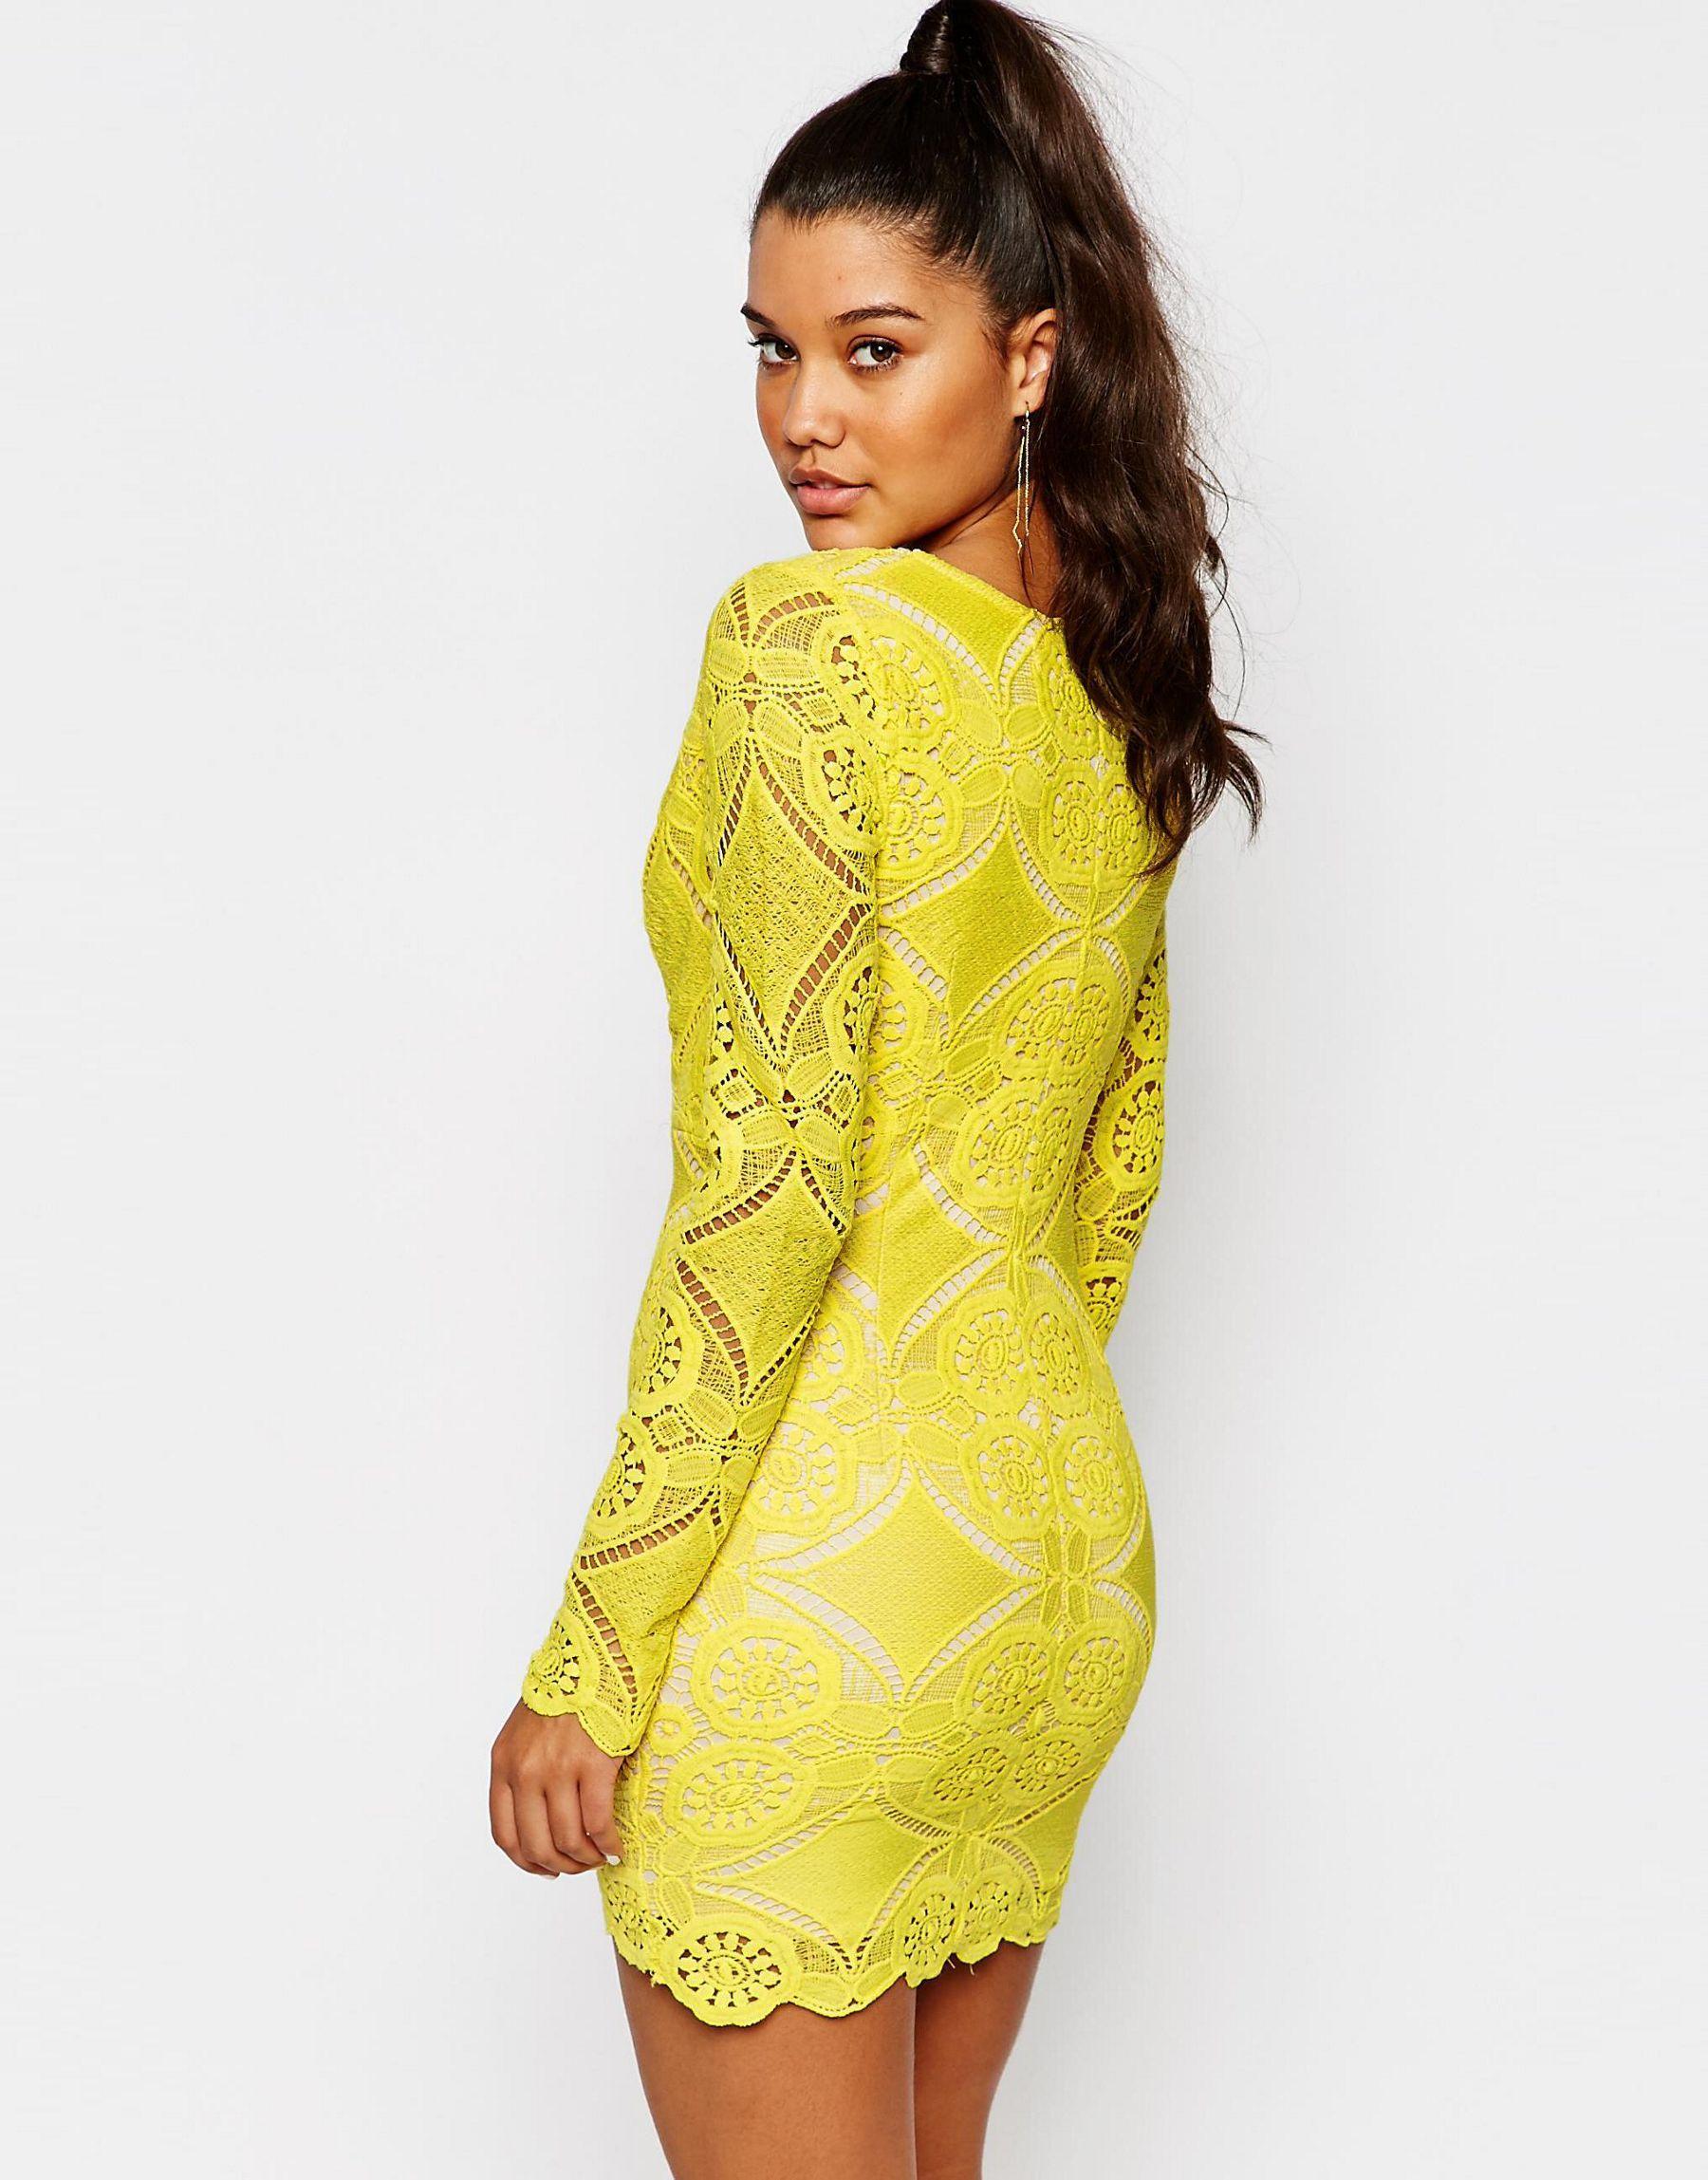 b22bc3b735 Lyst - Love Triangle V Neck Mini Dress In Lace in Yellow